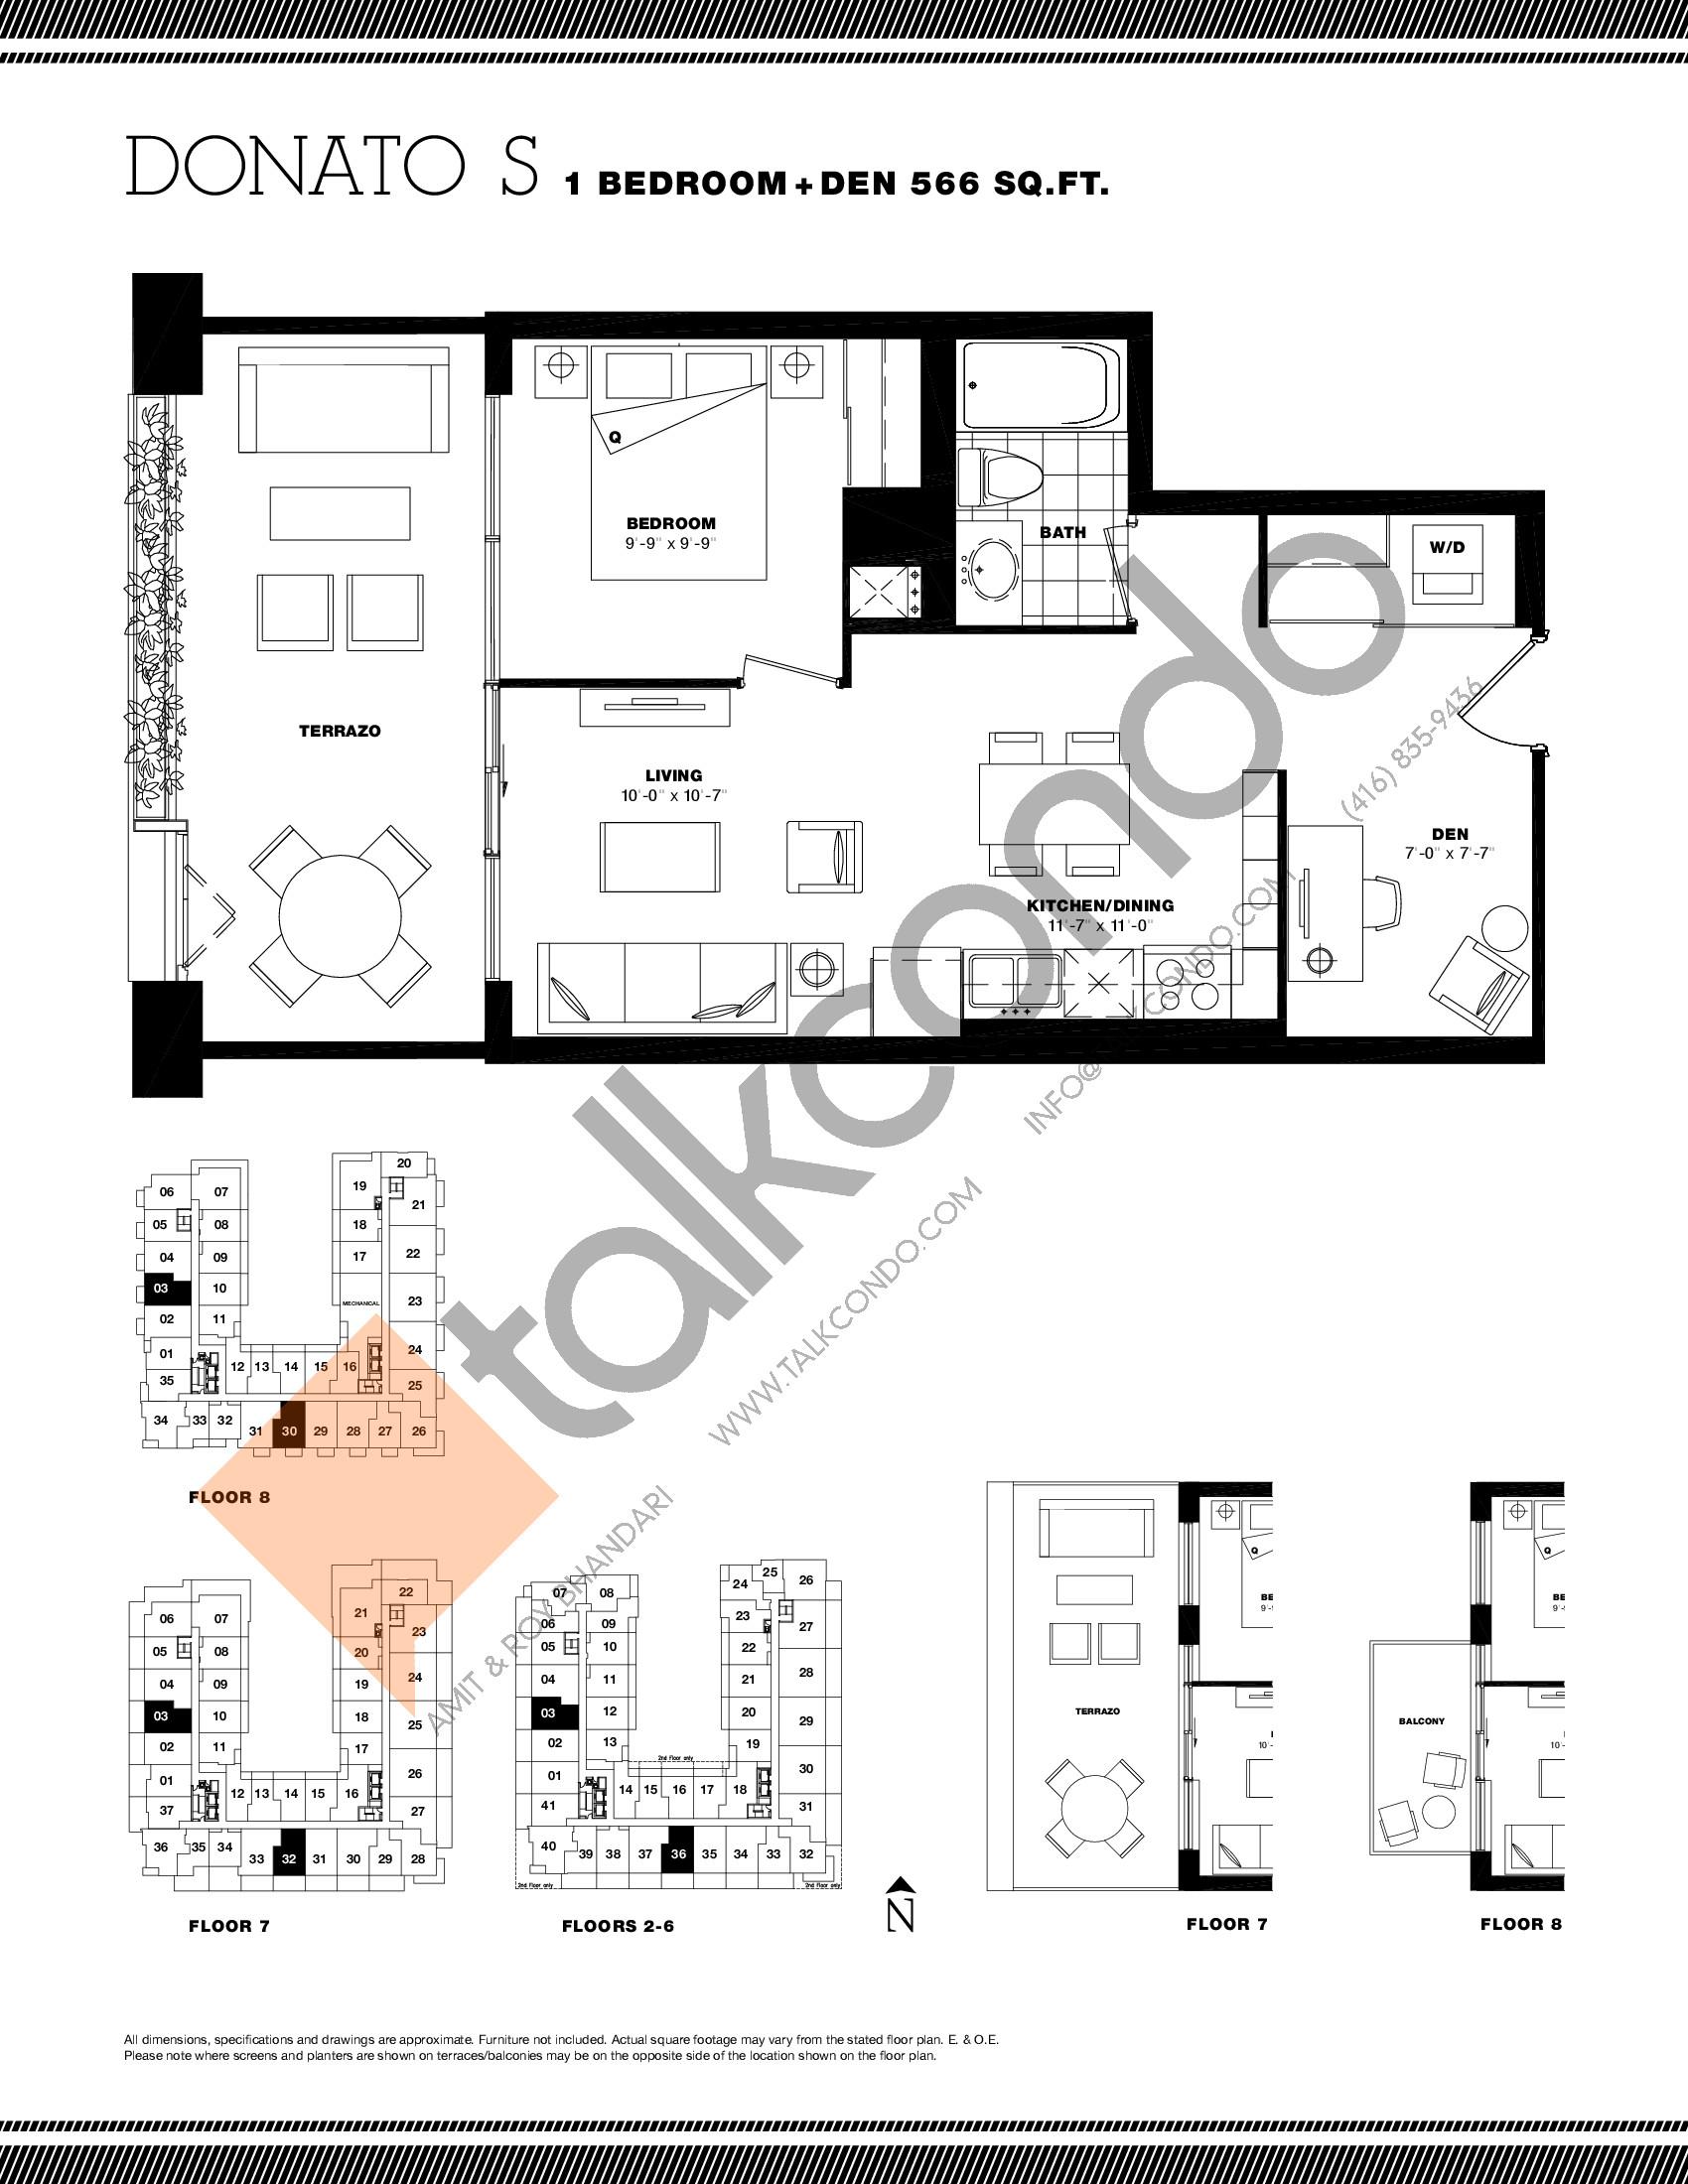 Donato S Floor Plan at Residenze Palazzo at Treviso 3 Condos - 566 sq.ft